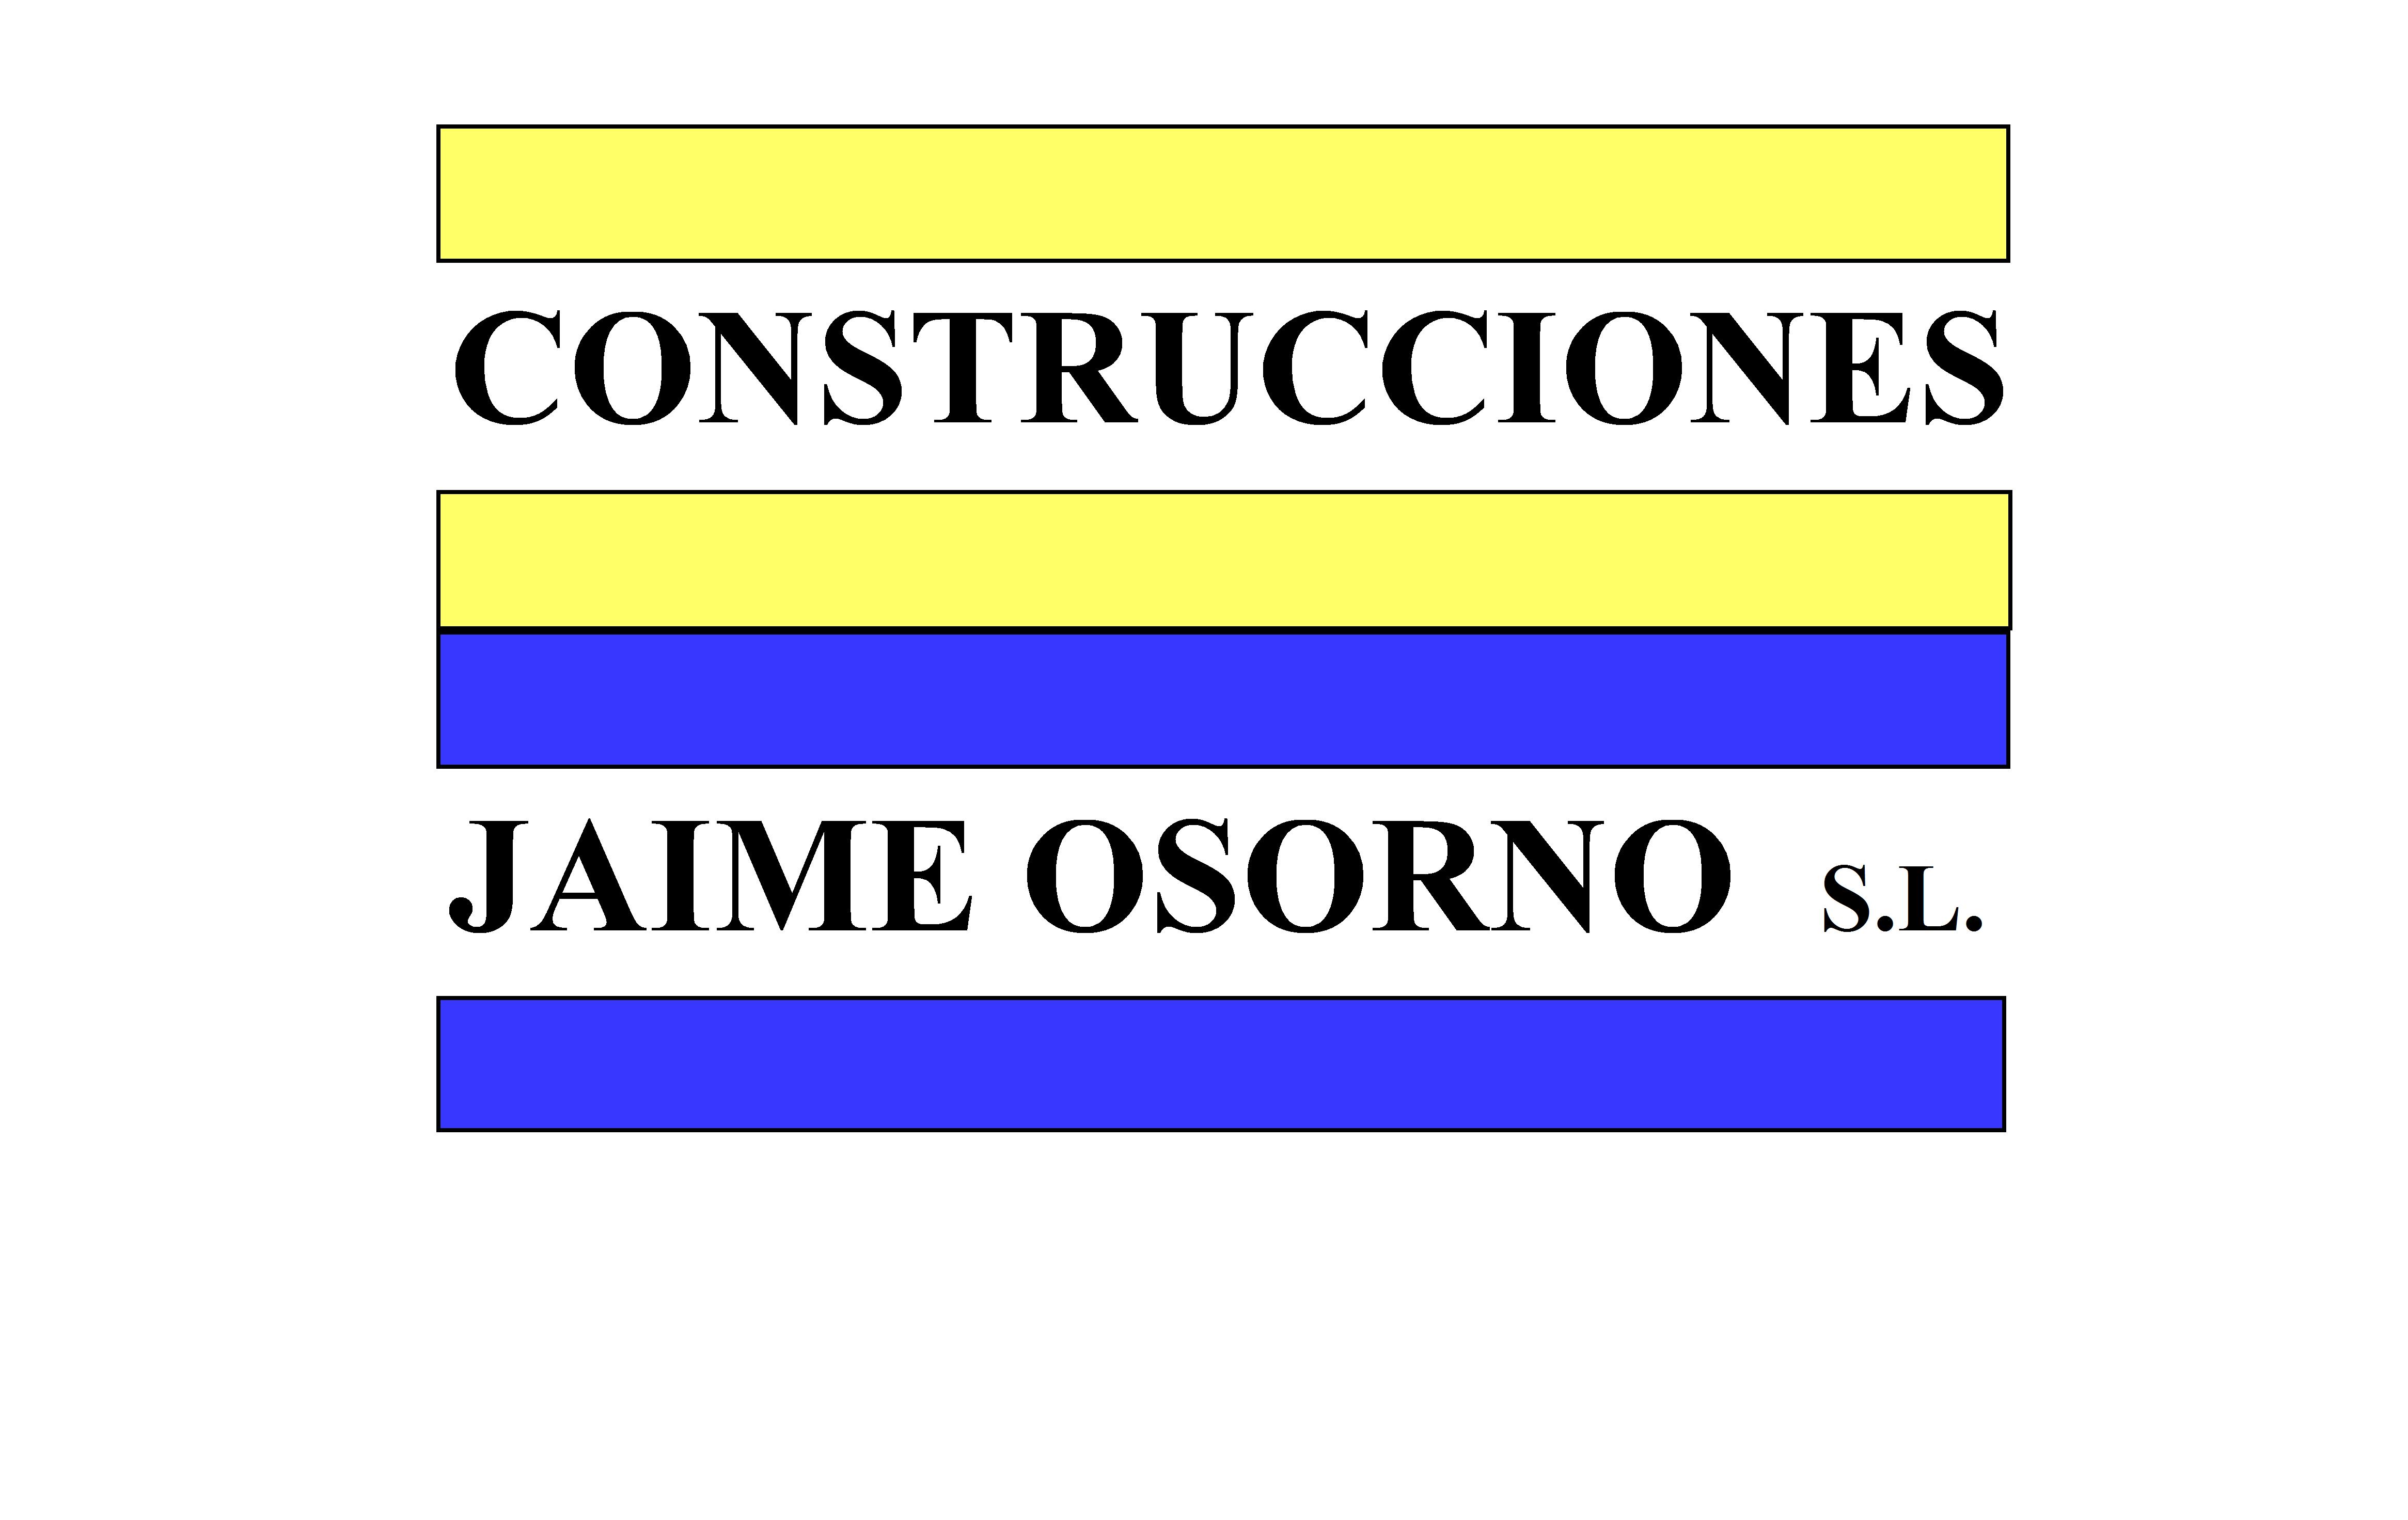 Jaime Osorno S.l.